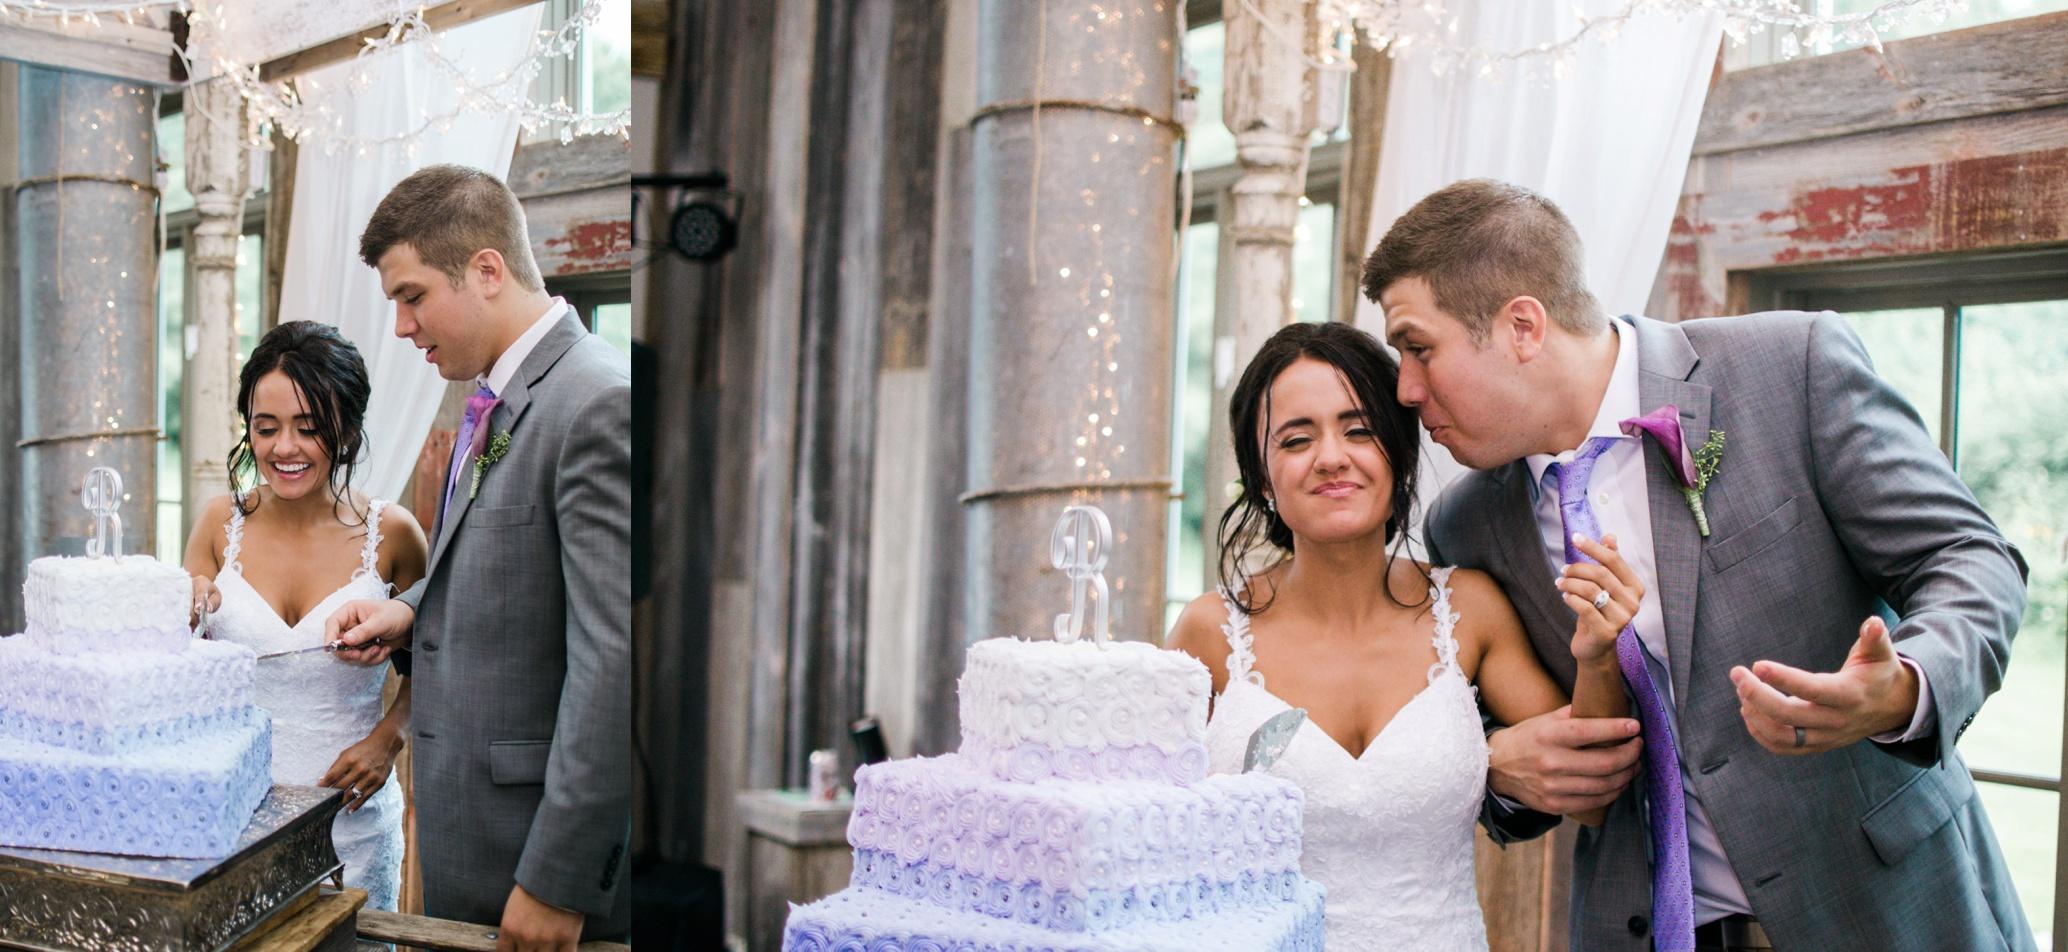 Barnes' Place Rustic Outdoor Wedding | Ali Leigh Photo Minneapolis Wedding Photographer_0165.jpg